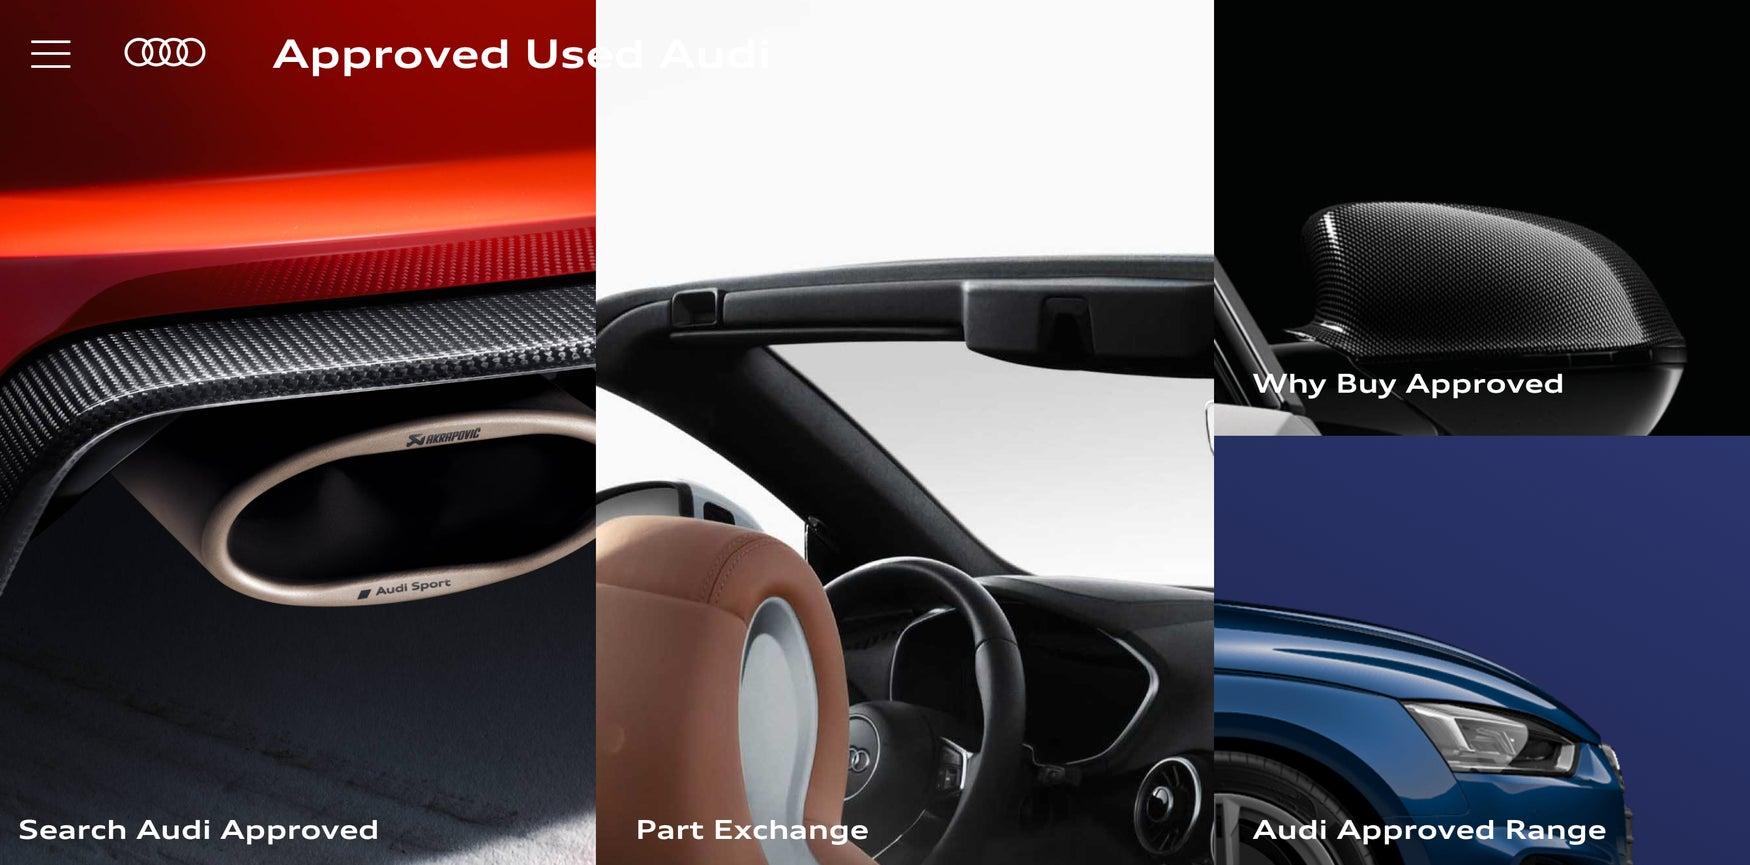 Audi buying graphic